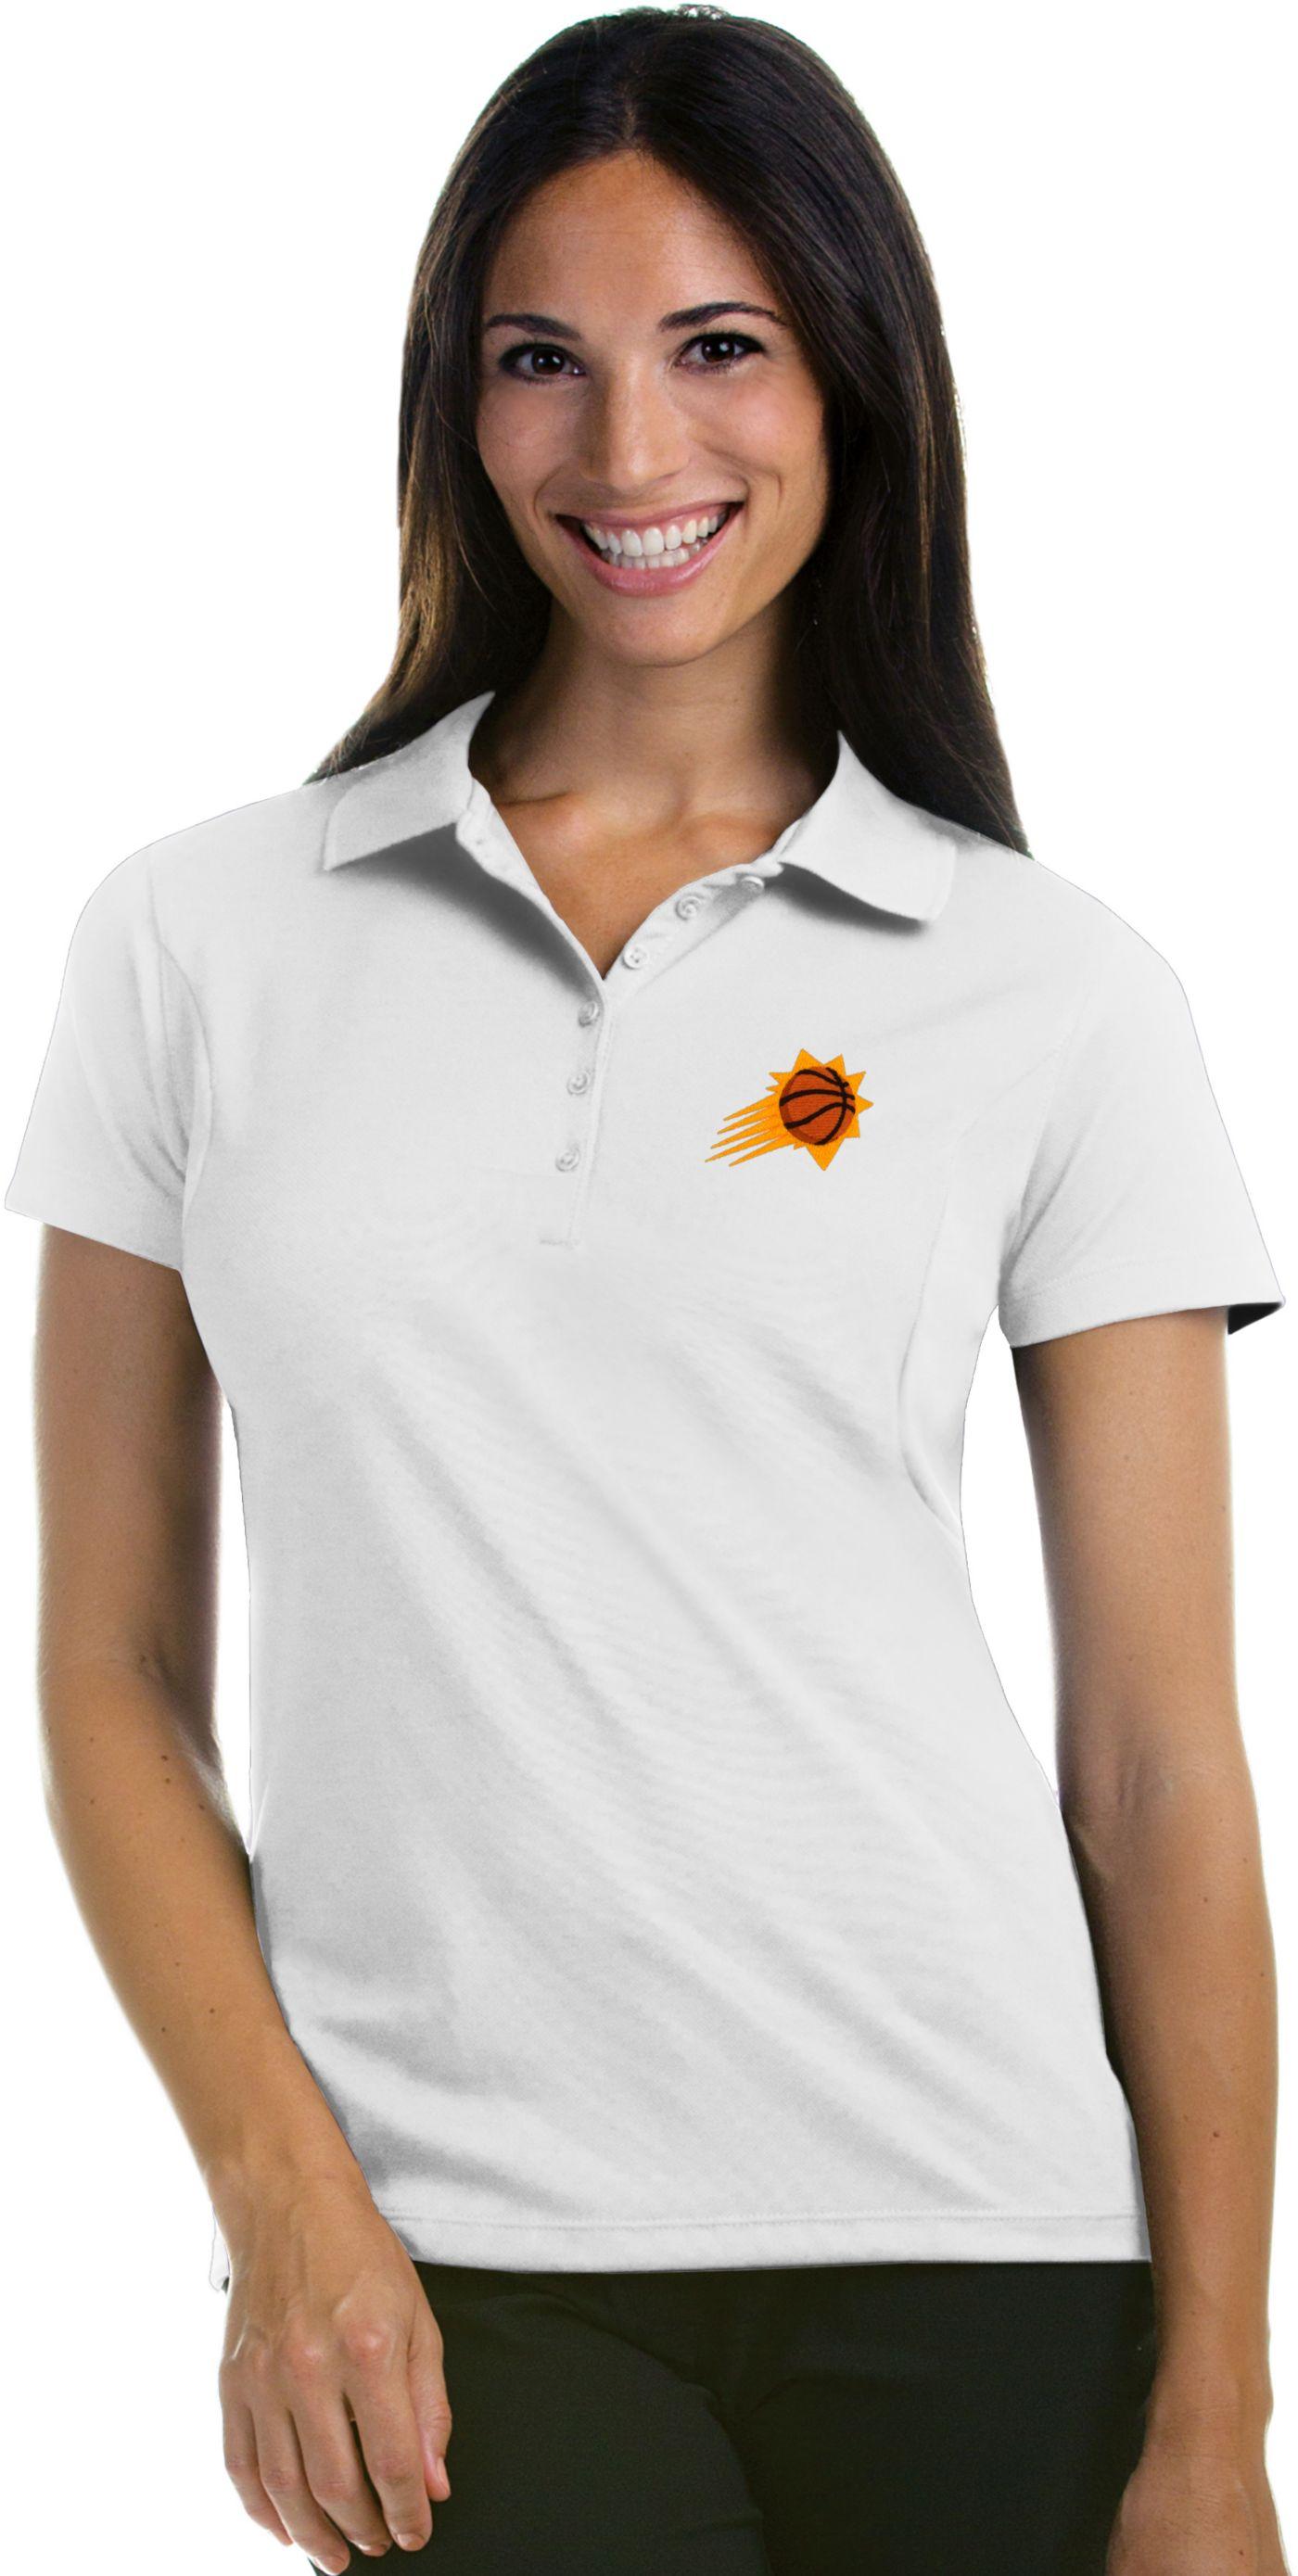 Antigua Women's Phoenix Suns Xtra-Lite White Pique Performance Polo